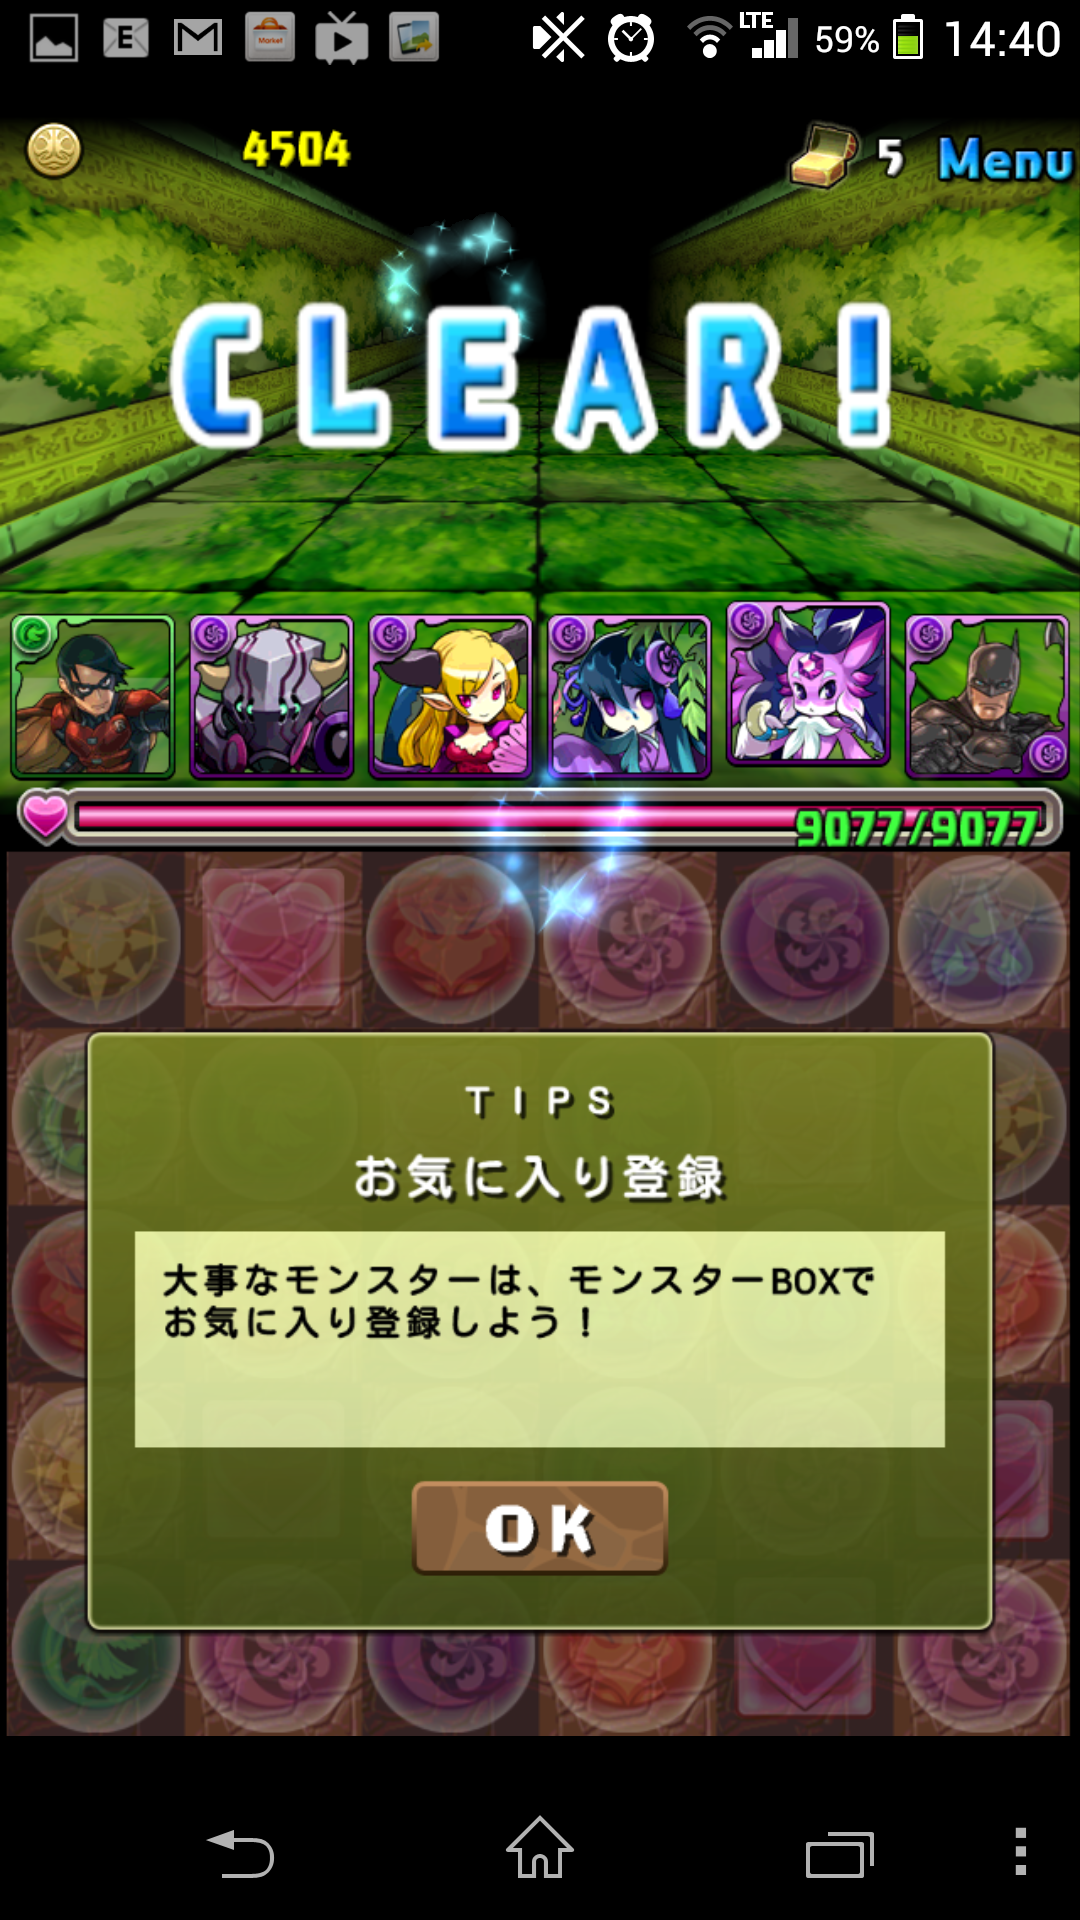 Screenshot_2014-04-01-14-40-27.png